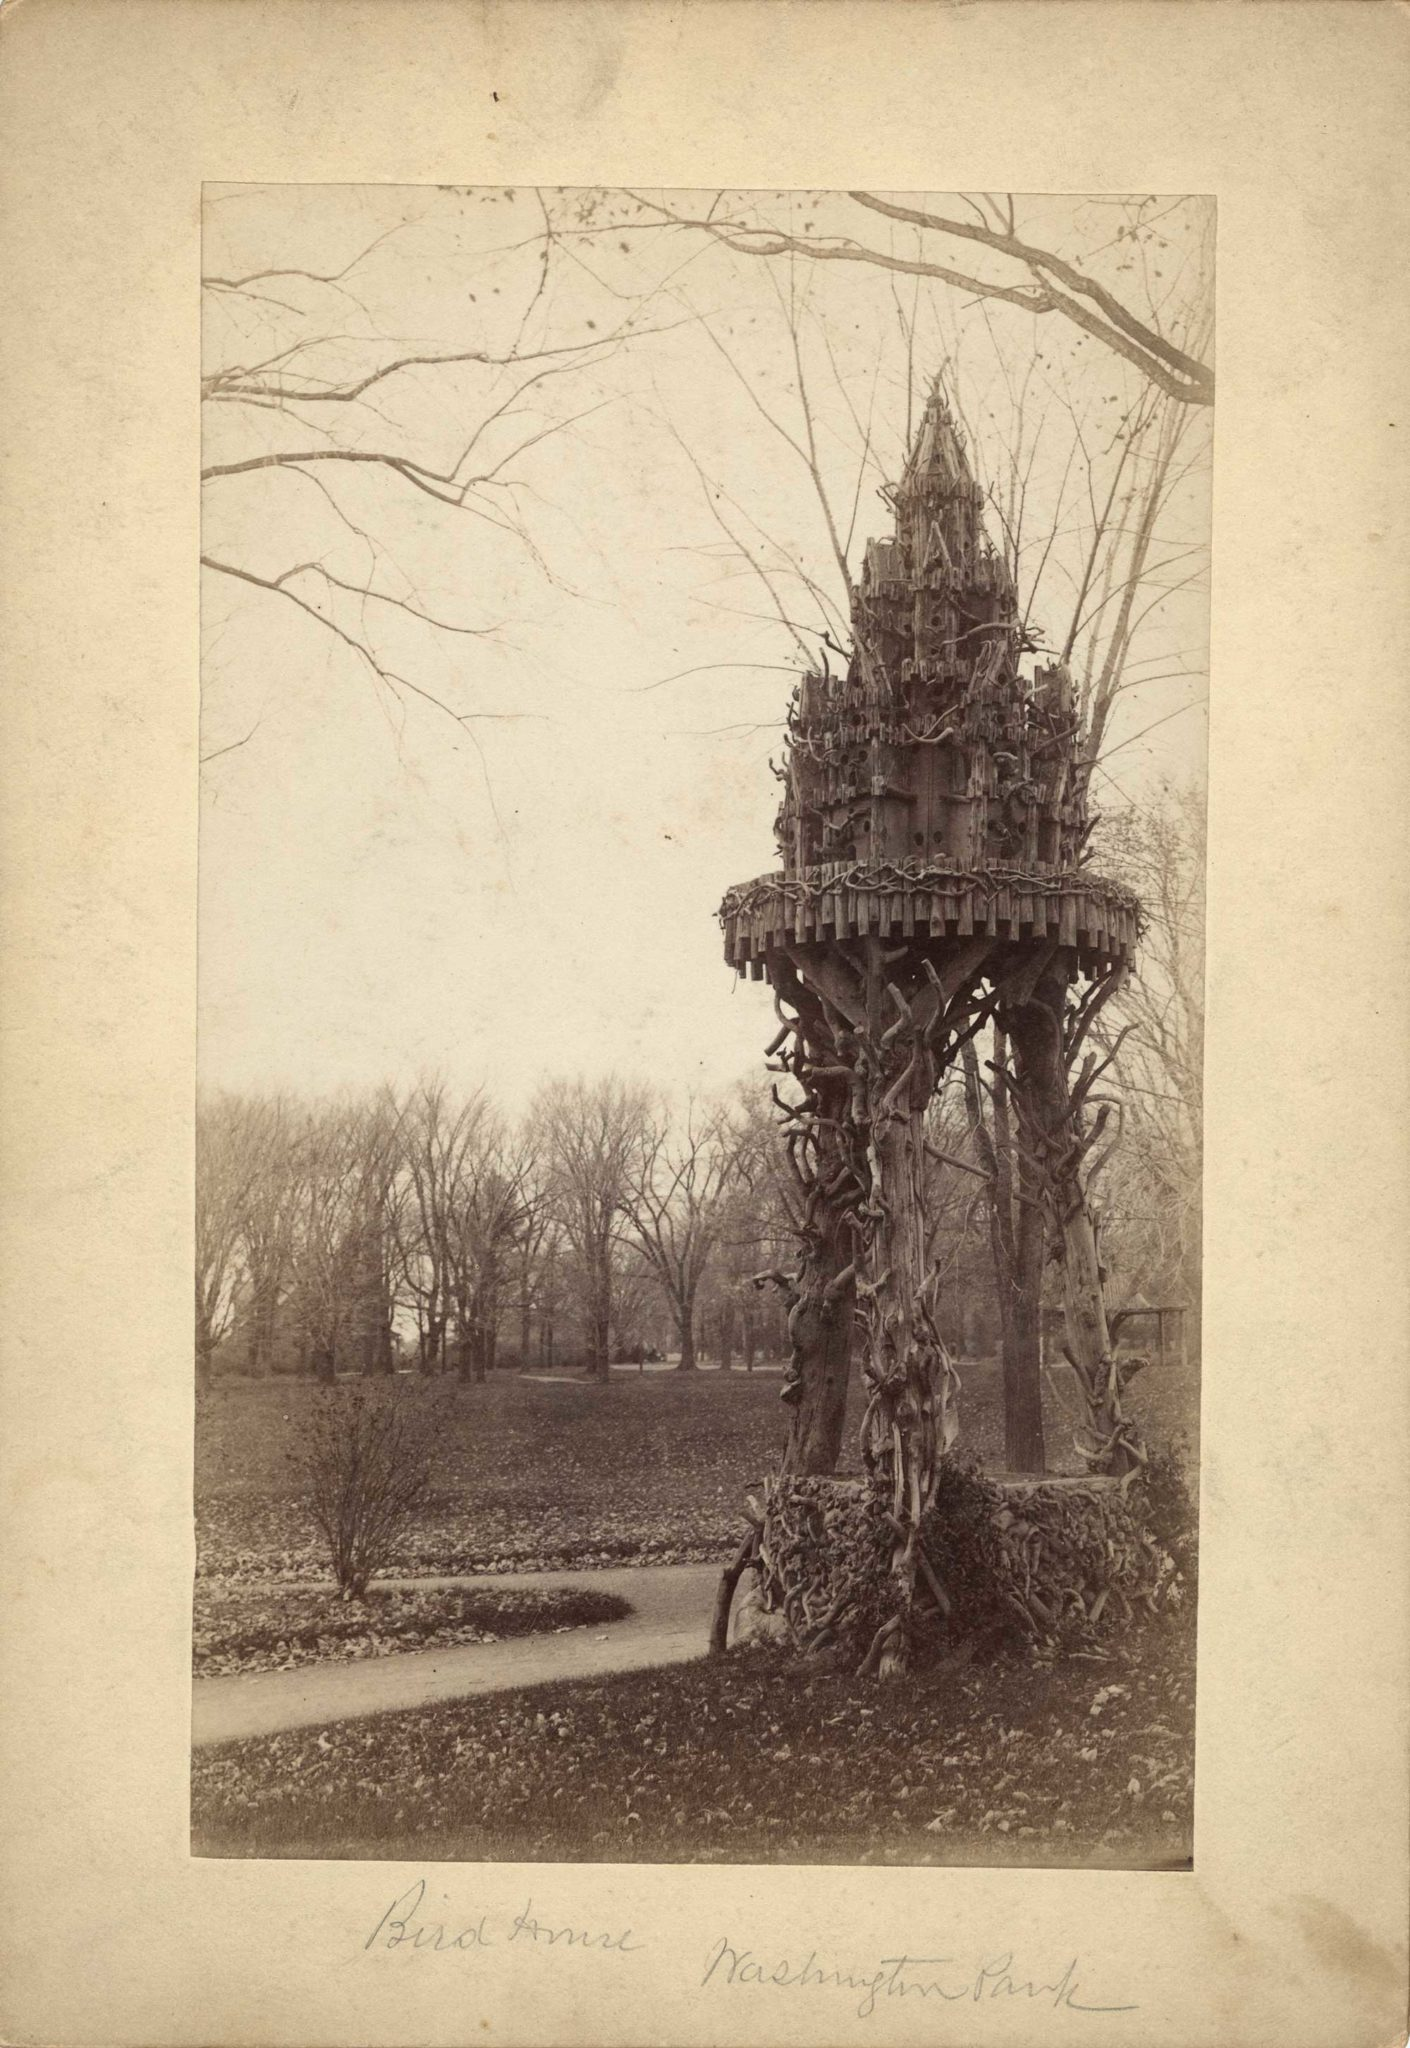 19th Century Rustic Birdhouse